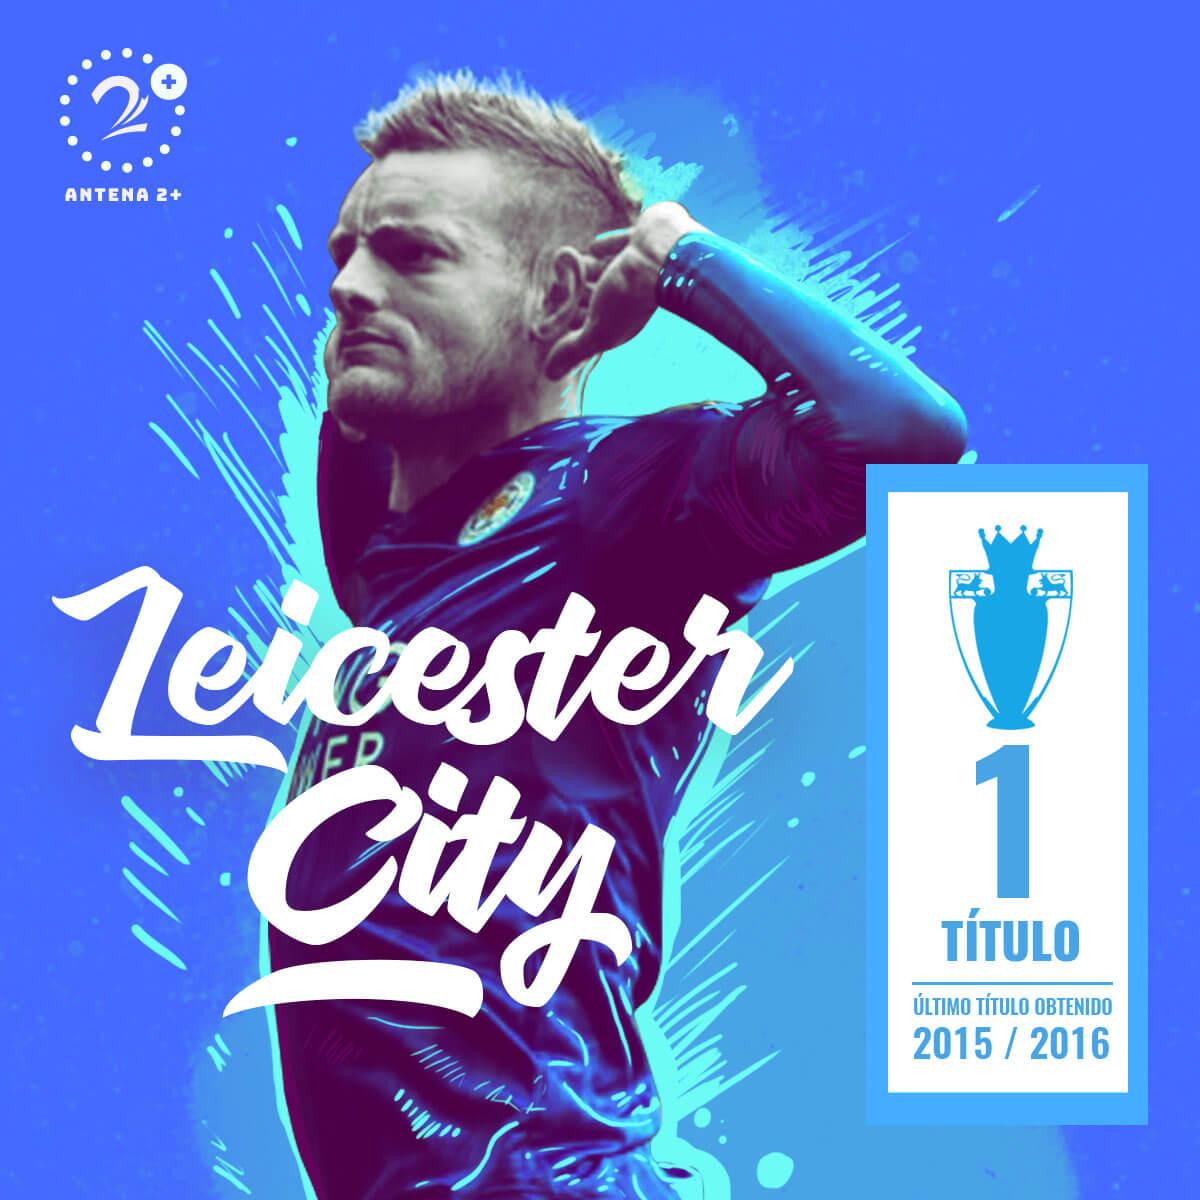 Leicester City, campeón en 2016 de la Premier League